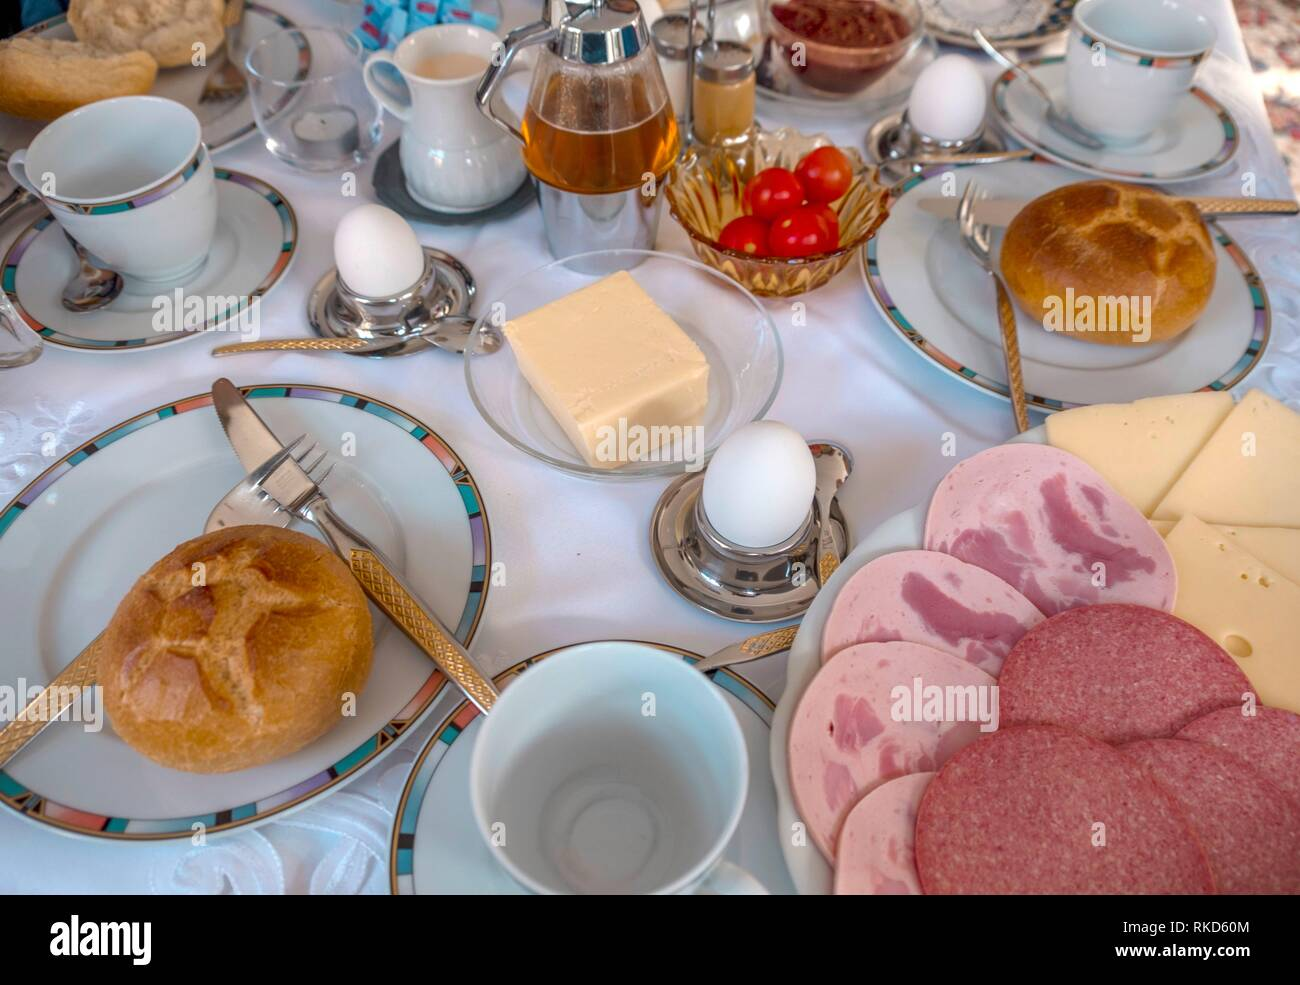 Germany, Food, Breakfast table. - Stock Image